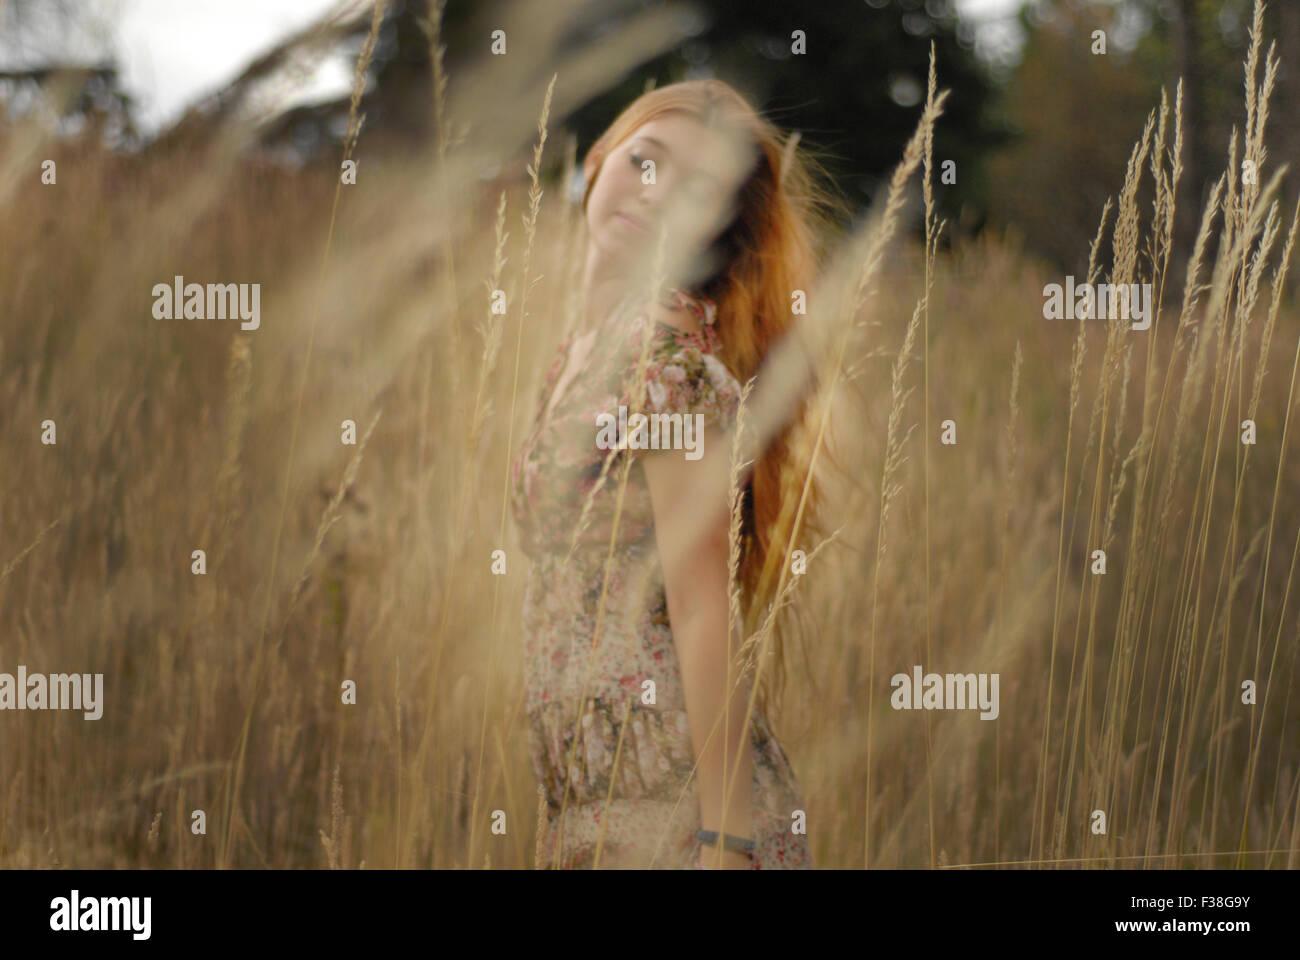 Ginger girl between the golden fields nice dress soft air - Stock Image